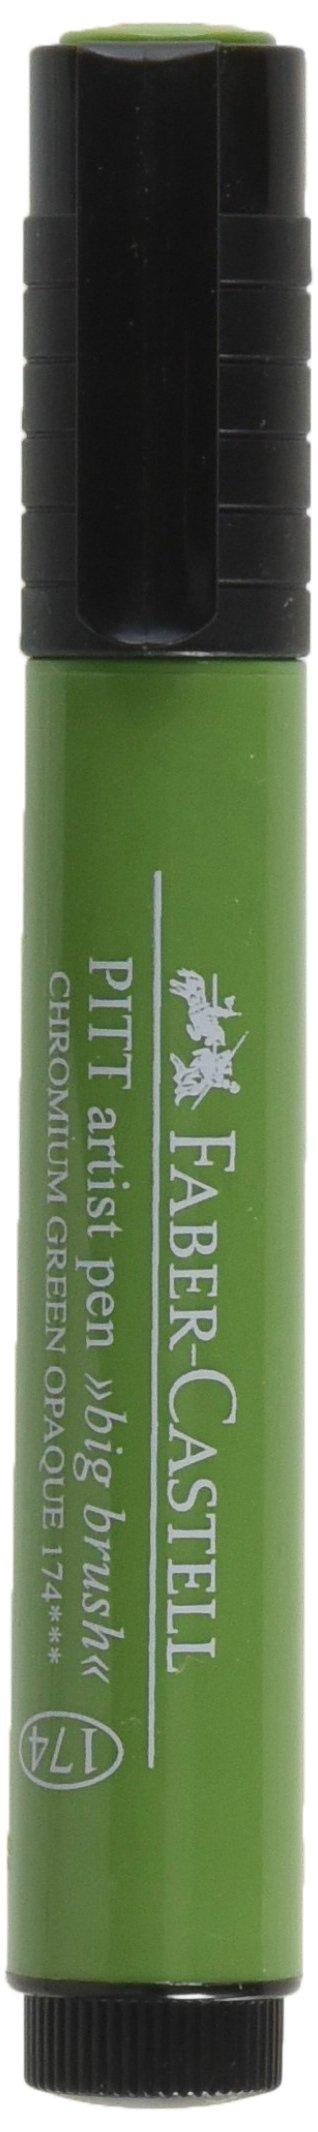 Faber-Castell Design Memory Craft FBR770006 Faber Castell Stampers Big Brush Pen Chrome Green